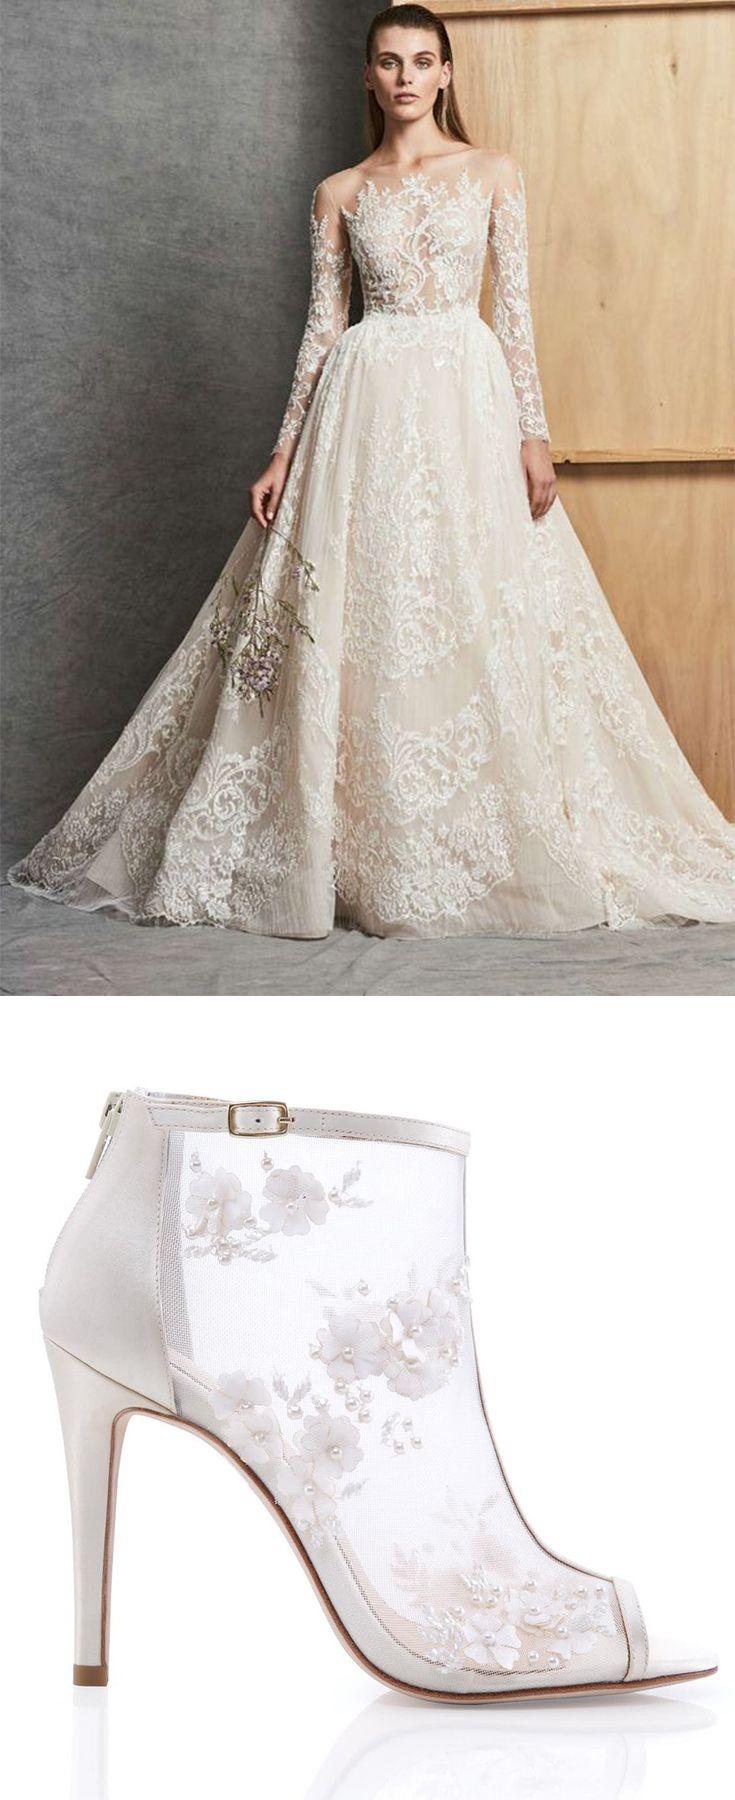 Belle Flower Chiffon Pearl Wedding Bootie Zuhair Murad Bridal